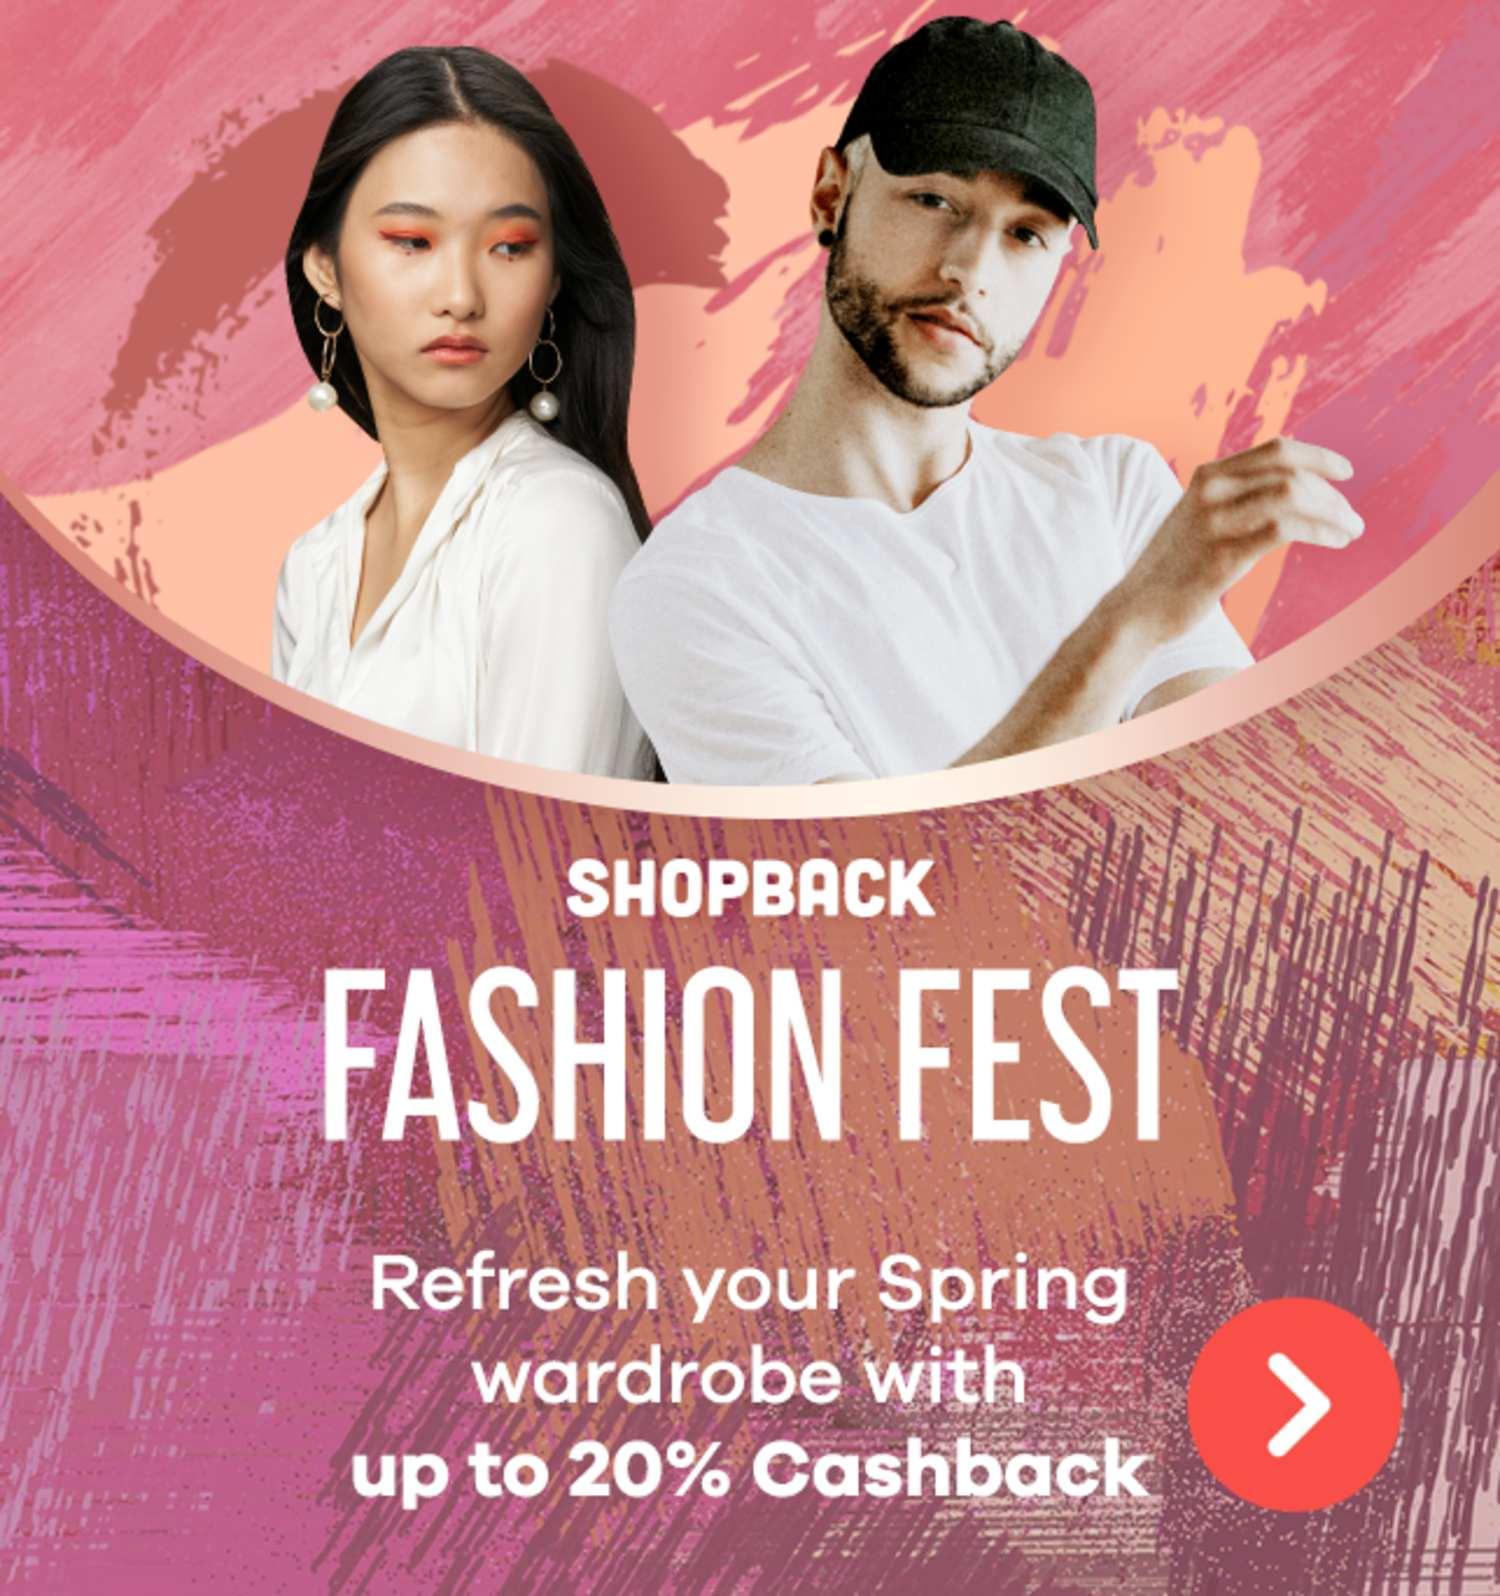 Fashion Festival   Cashback on Your Spring Wardrobe